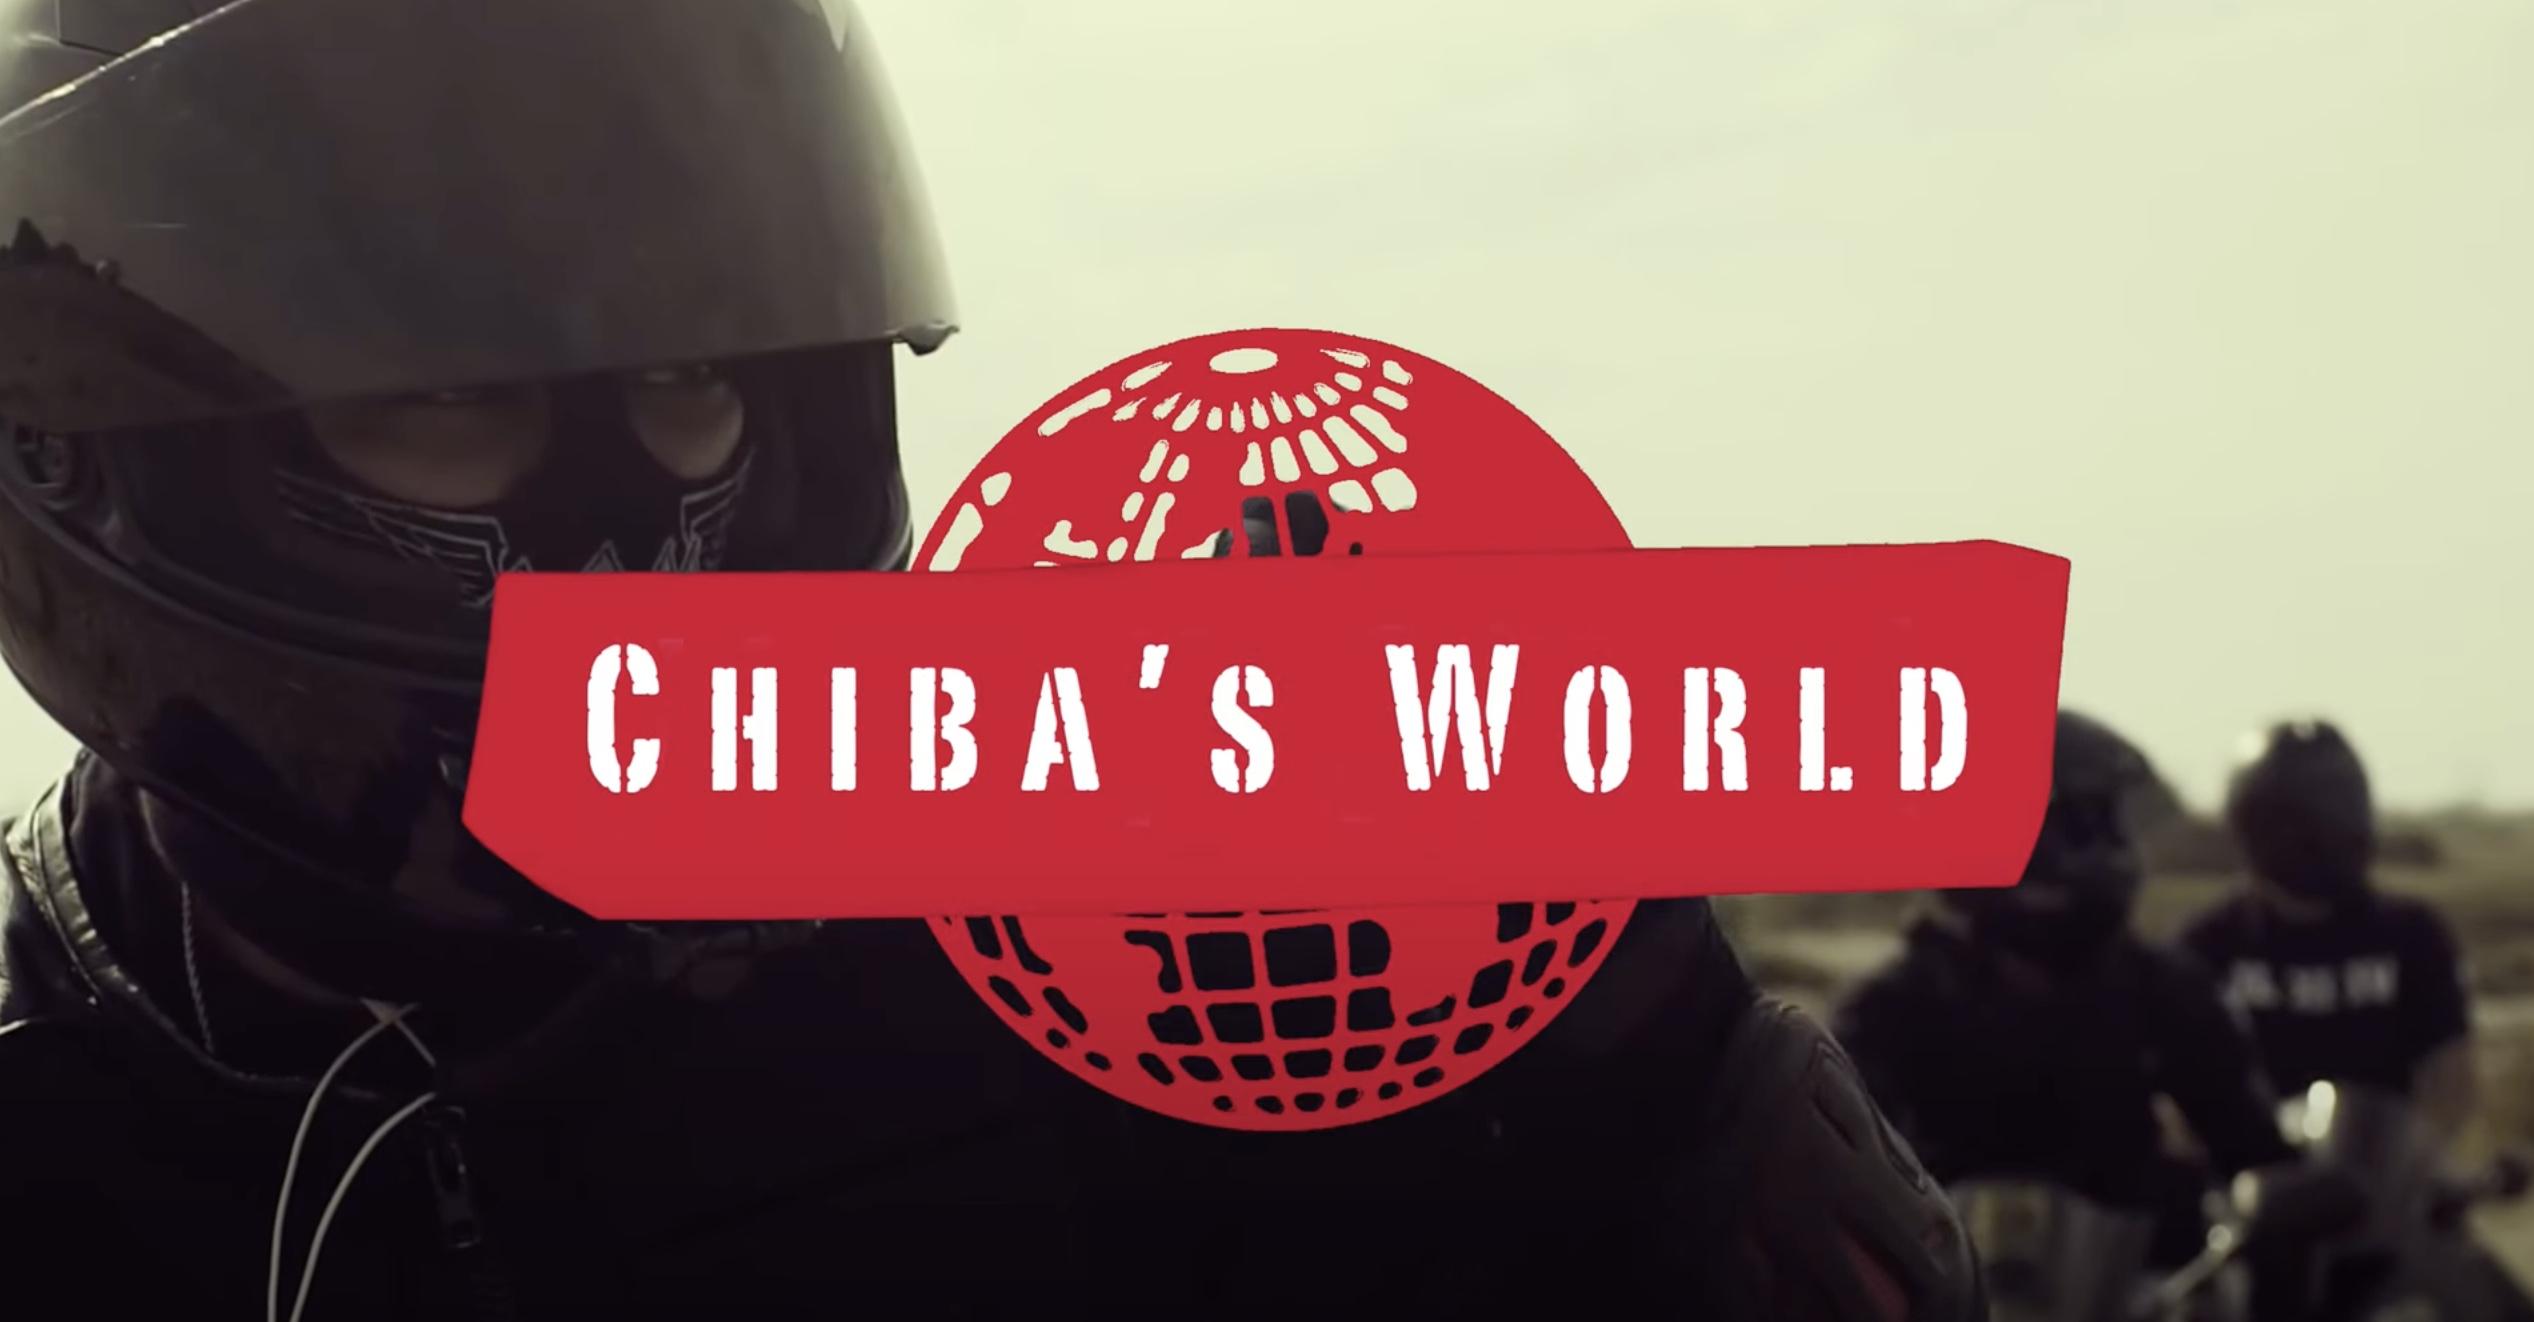 Chiba's World